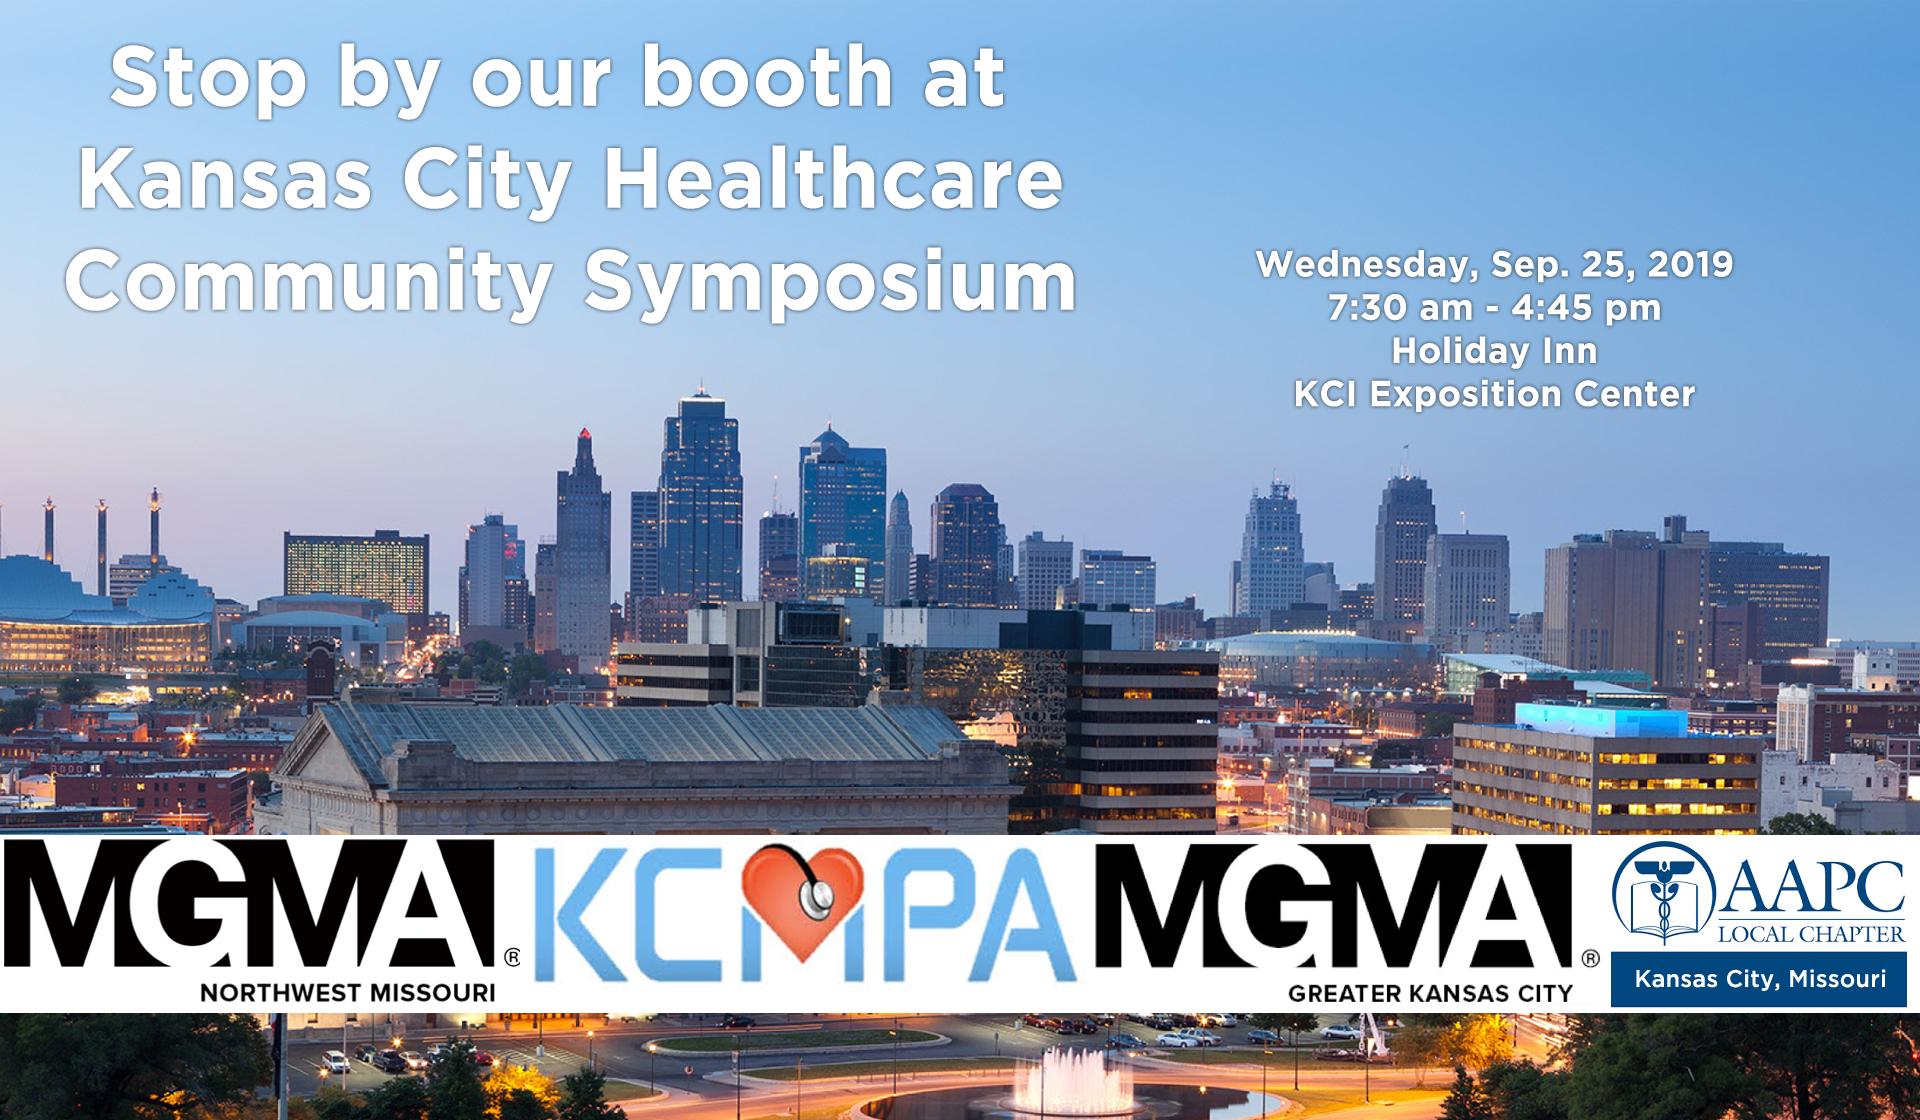 Kansas City Healthcare Community Symposium Wednesday, September 25, 2019